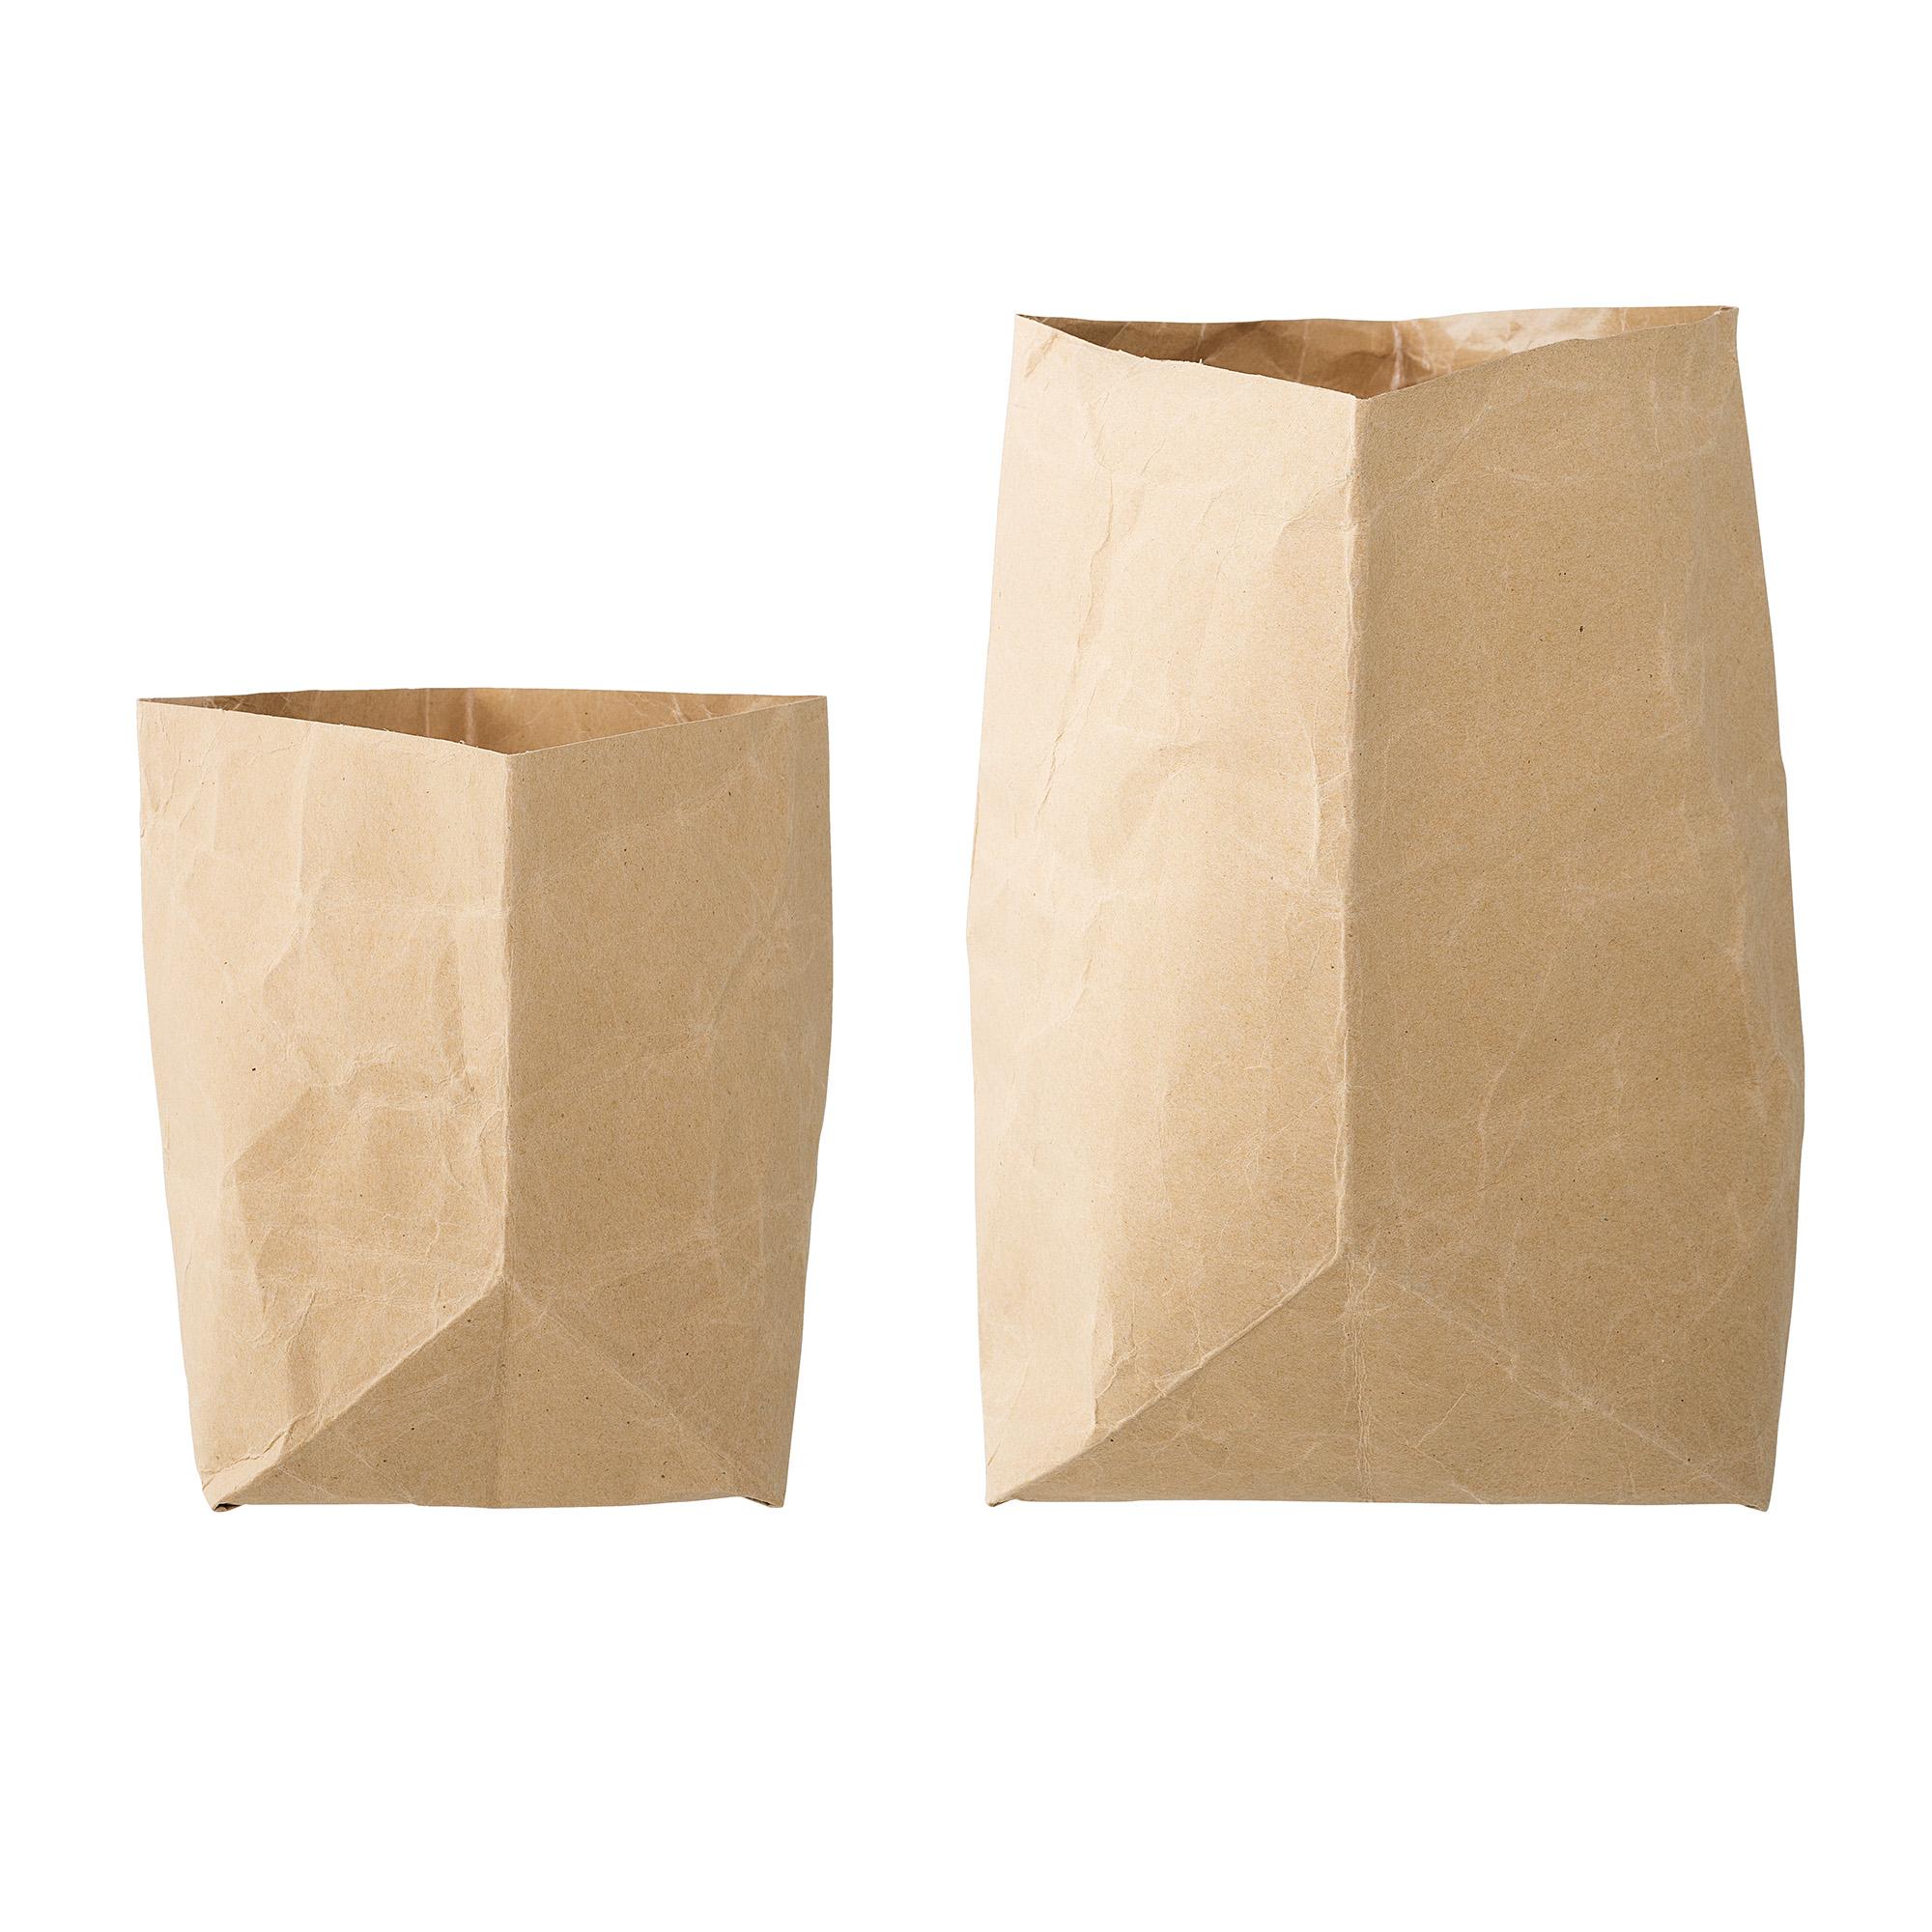 Papperspåsar 2 st. 15x20x15/20x30x20 cm